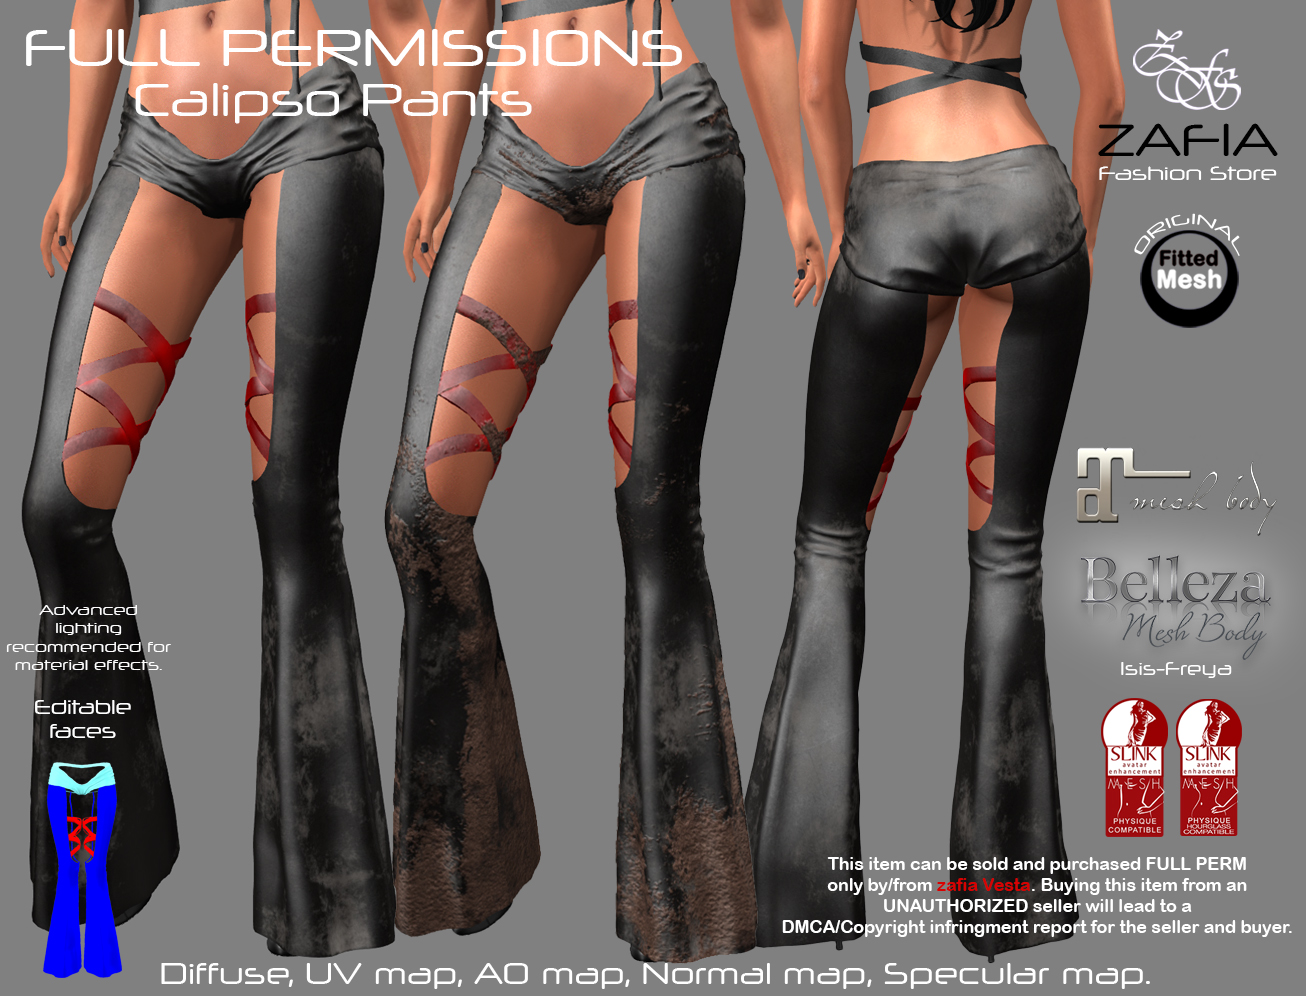 Full Perm ZAFIA Calipso Pants. – ZAFIA Fashion Store